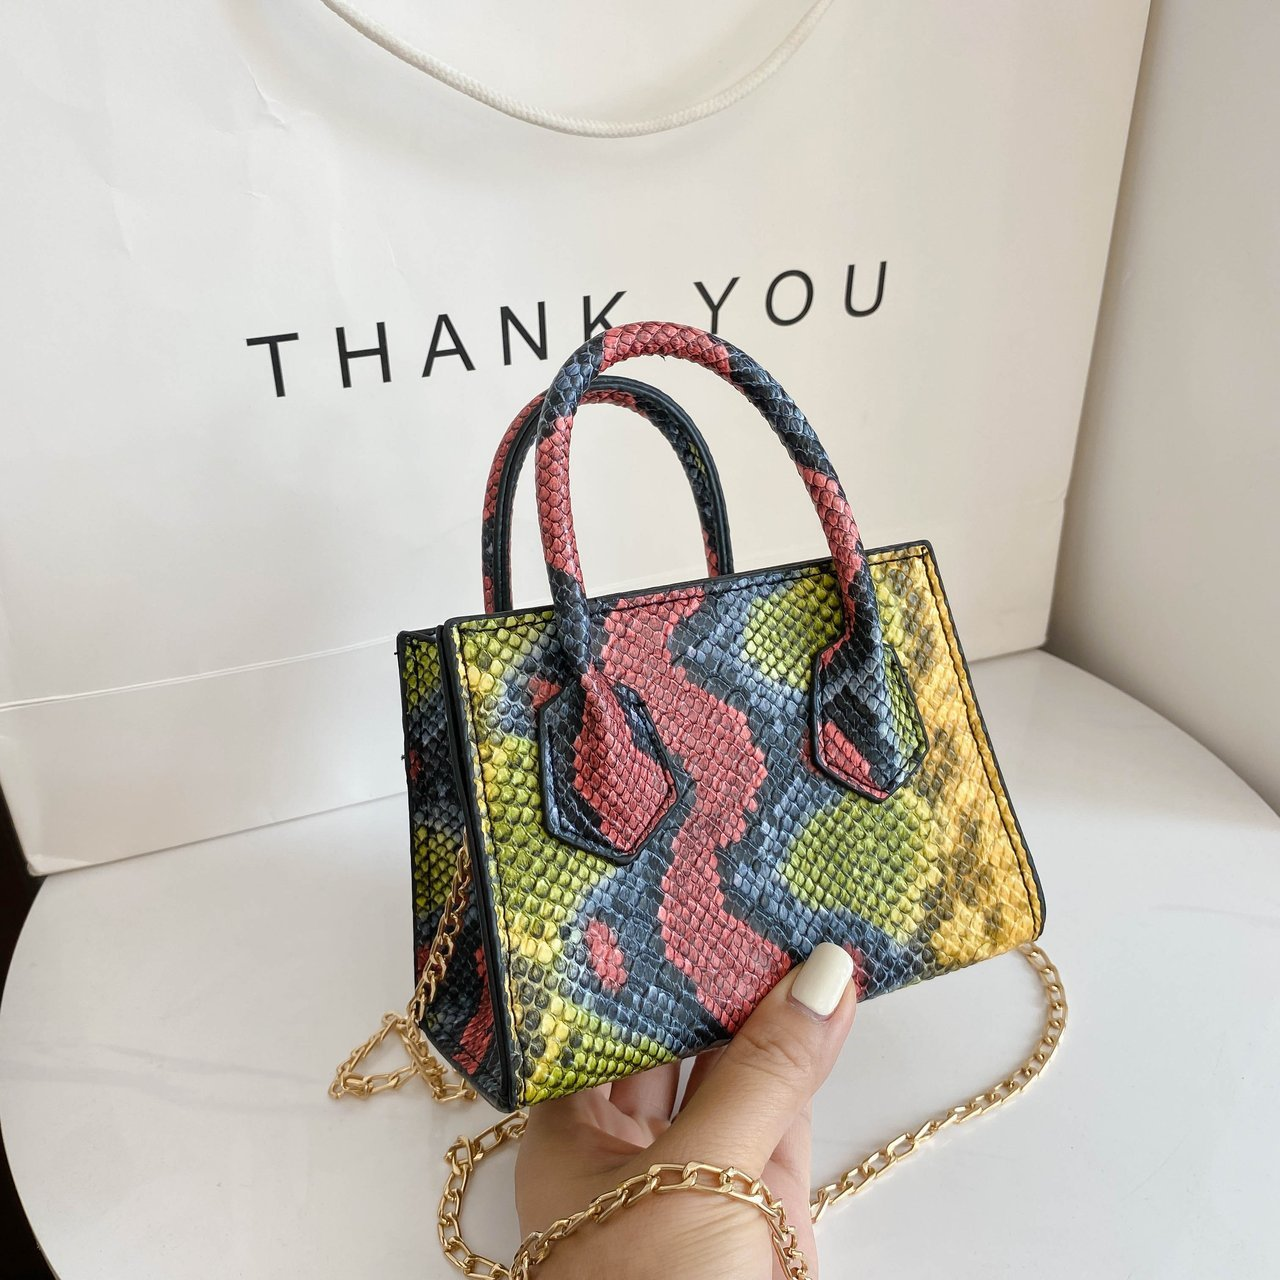 Female bag in Europe and the trend of the serpentine single shoulder bag worn handbag